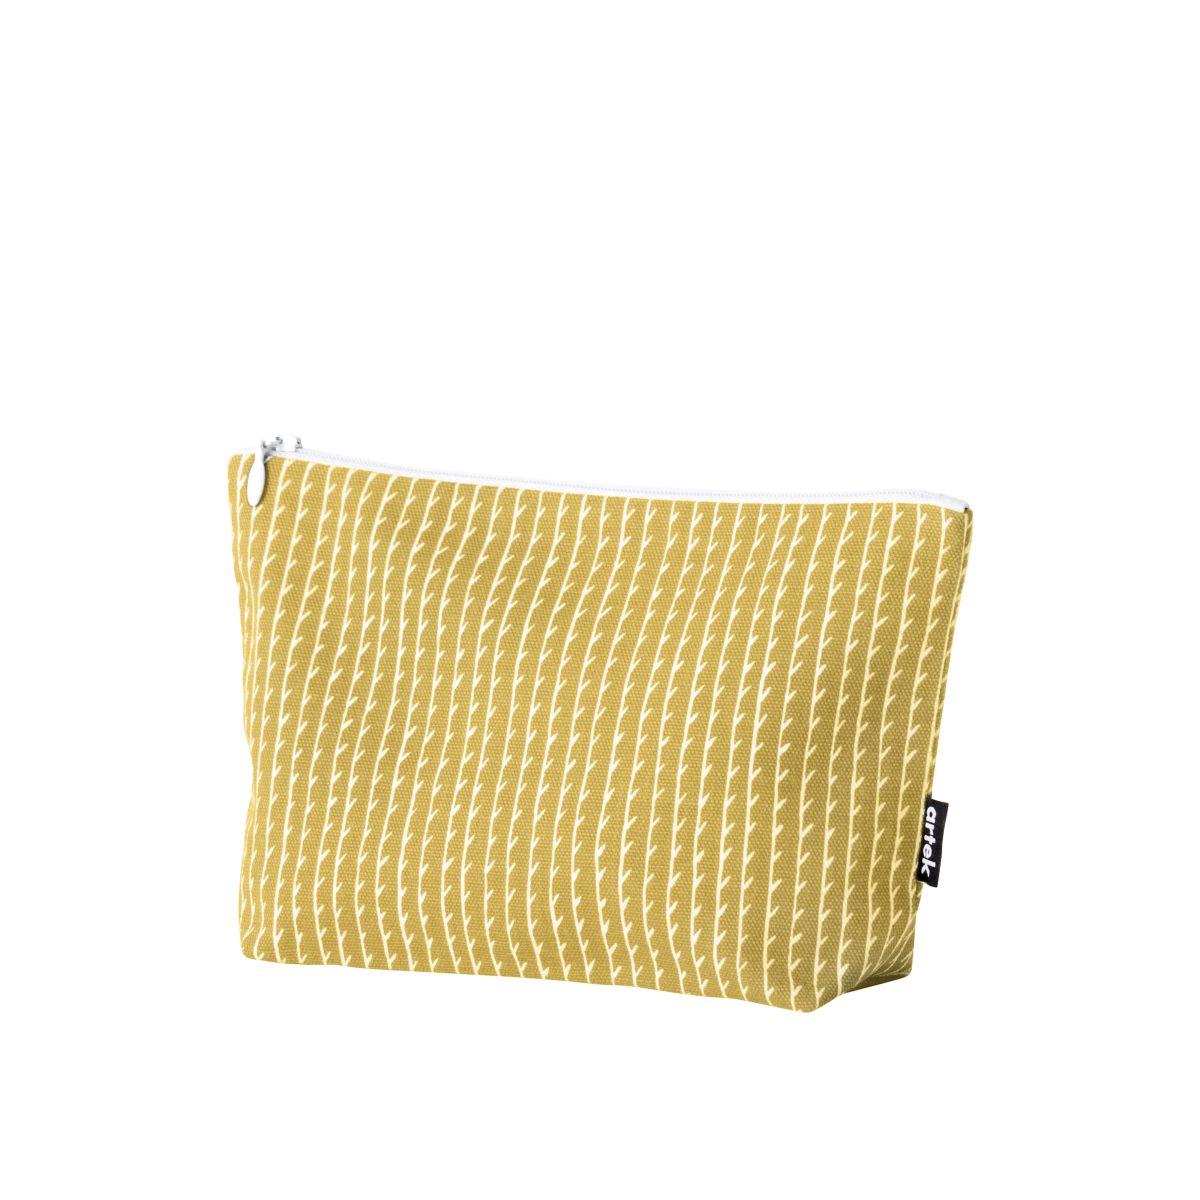 Rivi Pouch small yellow_white